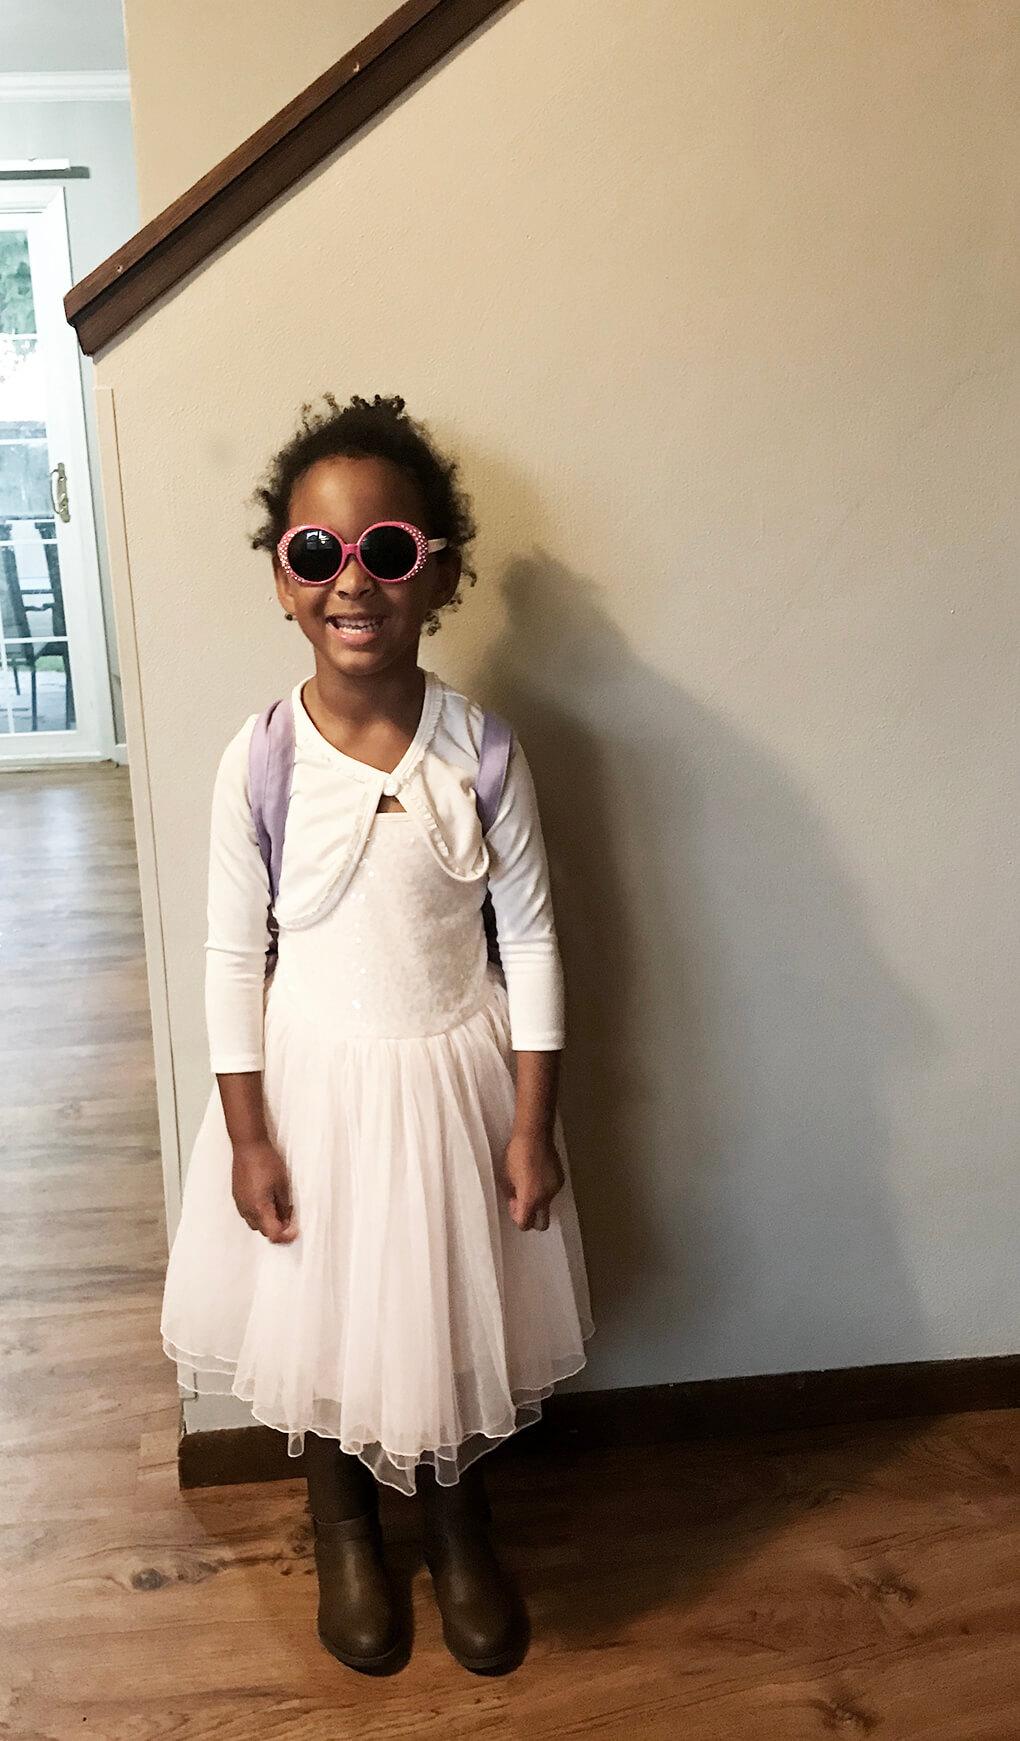 September 2018 Catch Up Over Bone Broth www.sarahkayhoffman.com Samarah Five Dress Sunglasses #lifestyleblogger #healthylifestyle